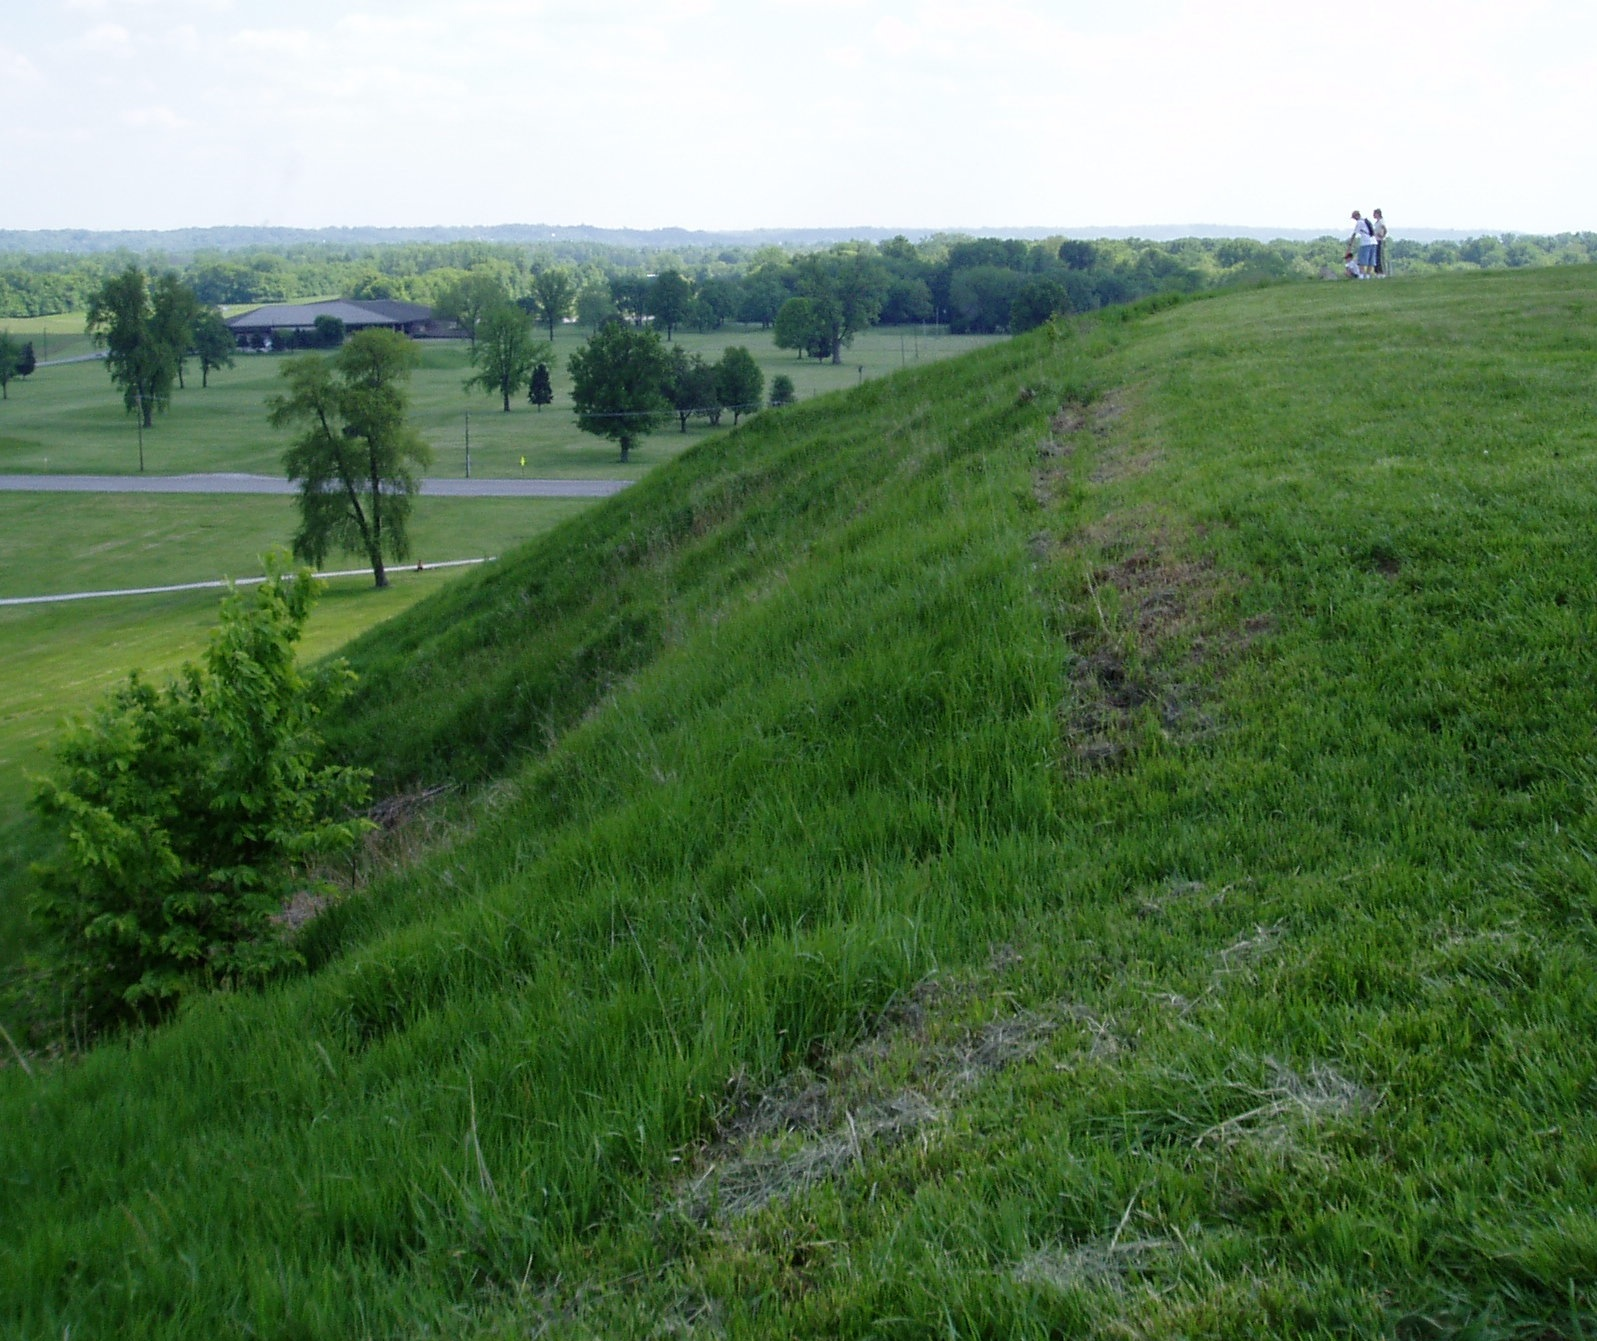 Cahokia Mounds State Park, site of the original Midwestern metropolis